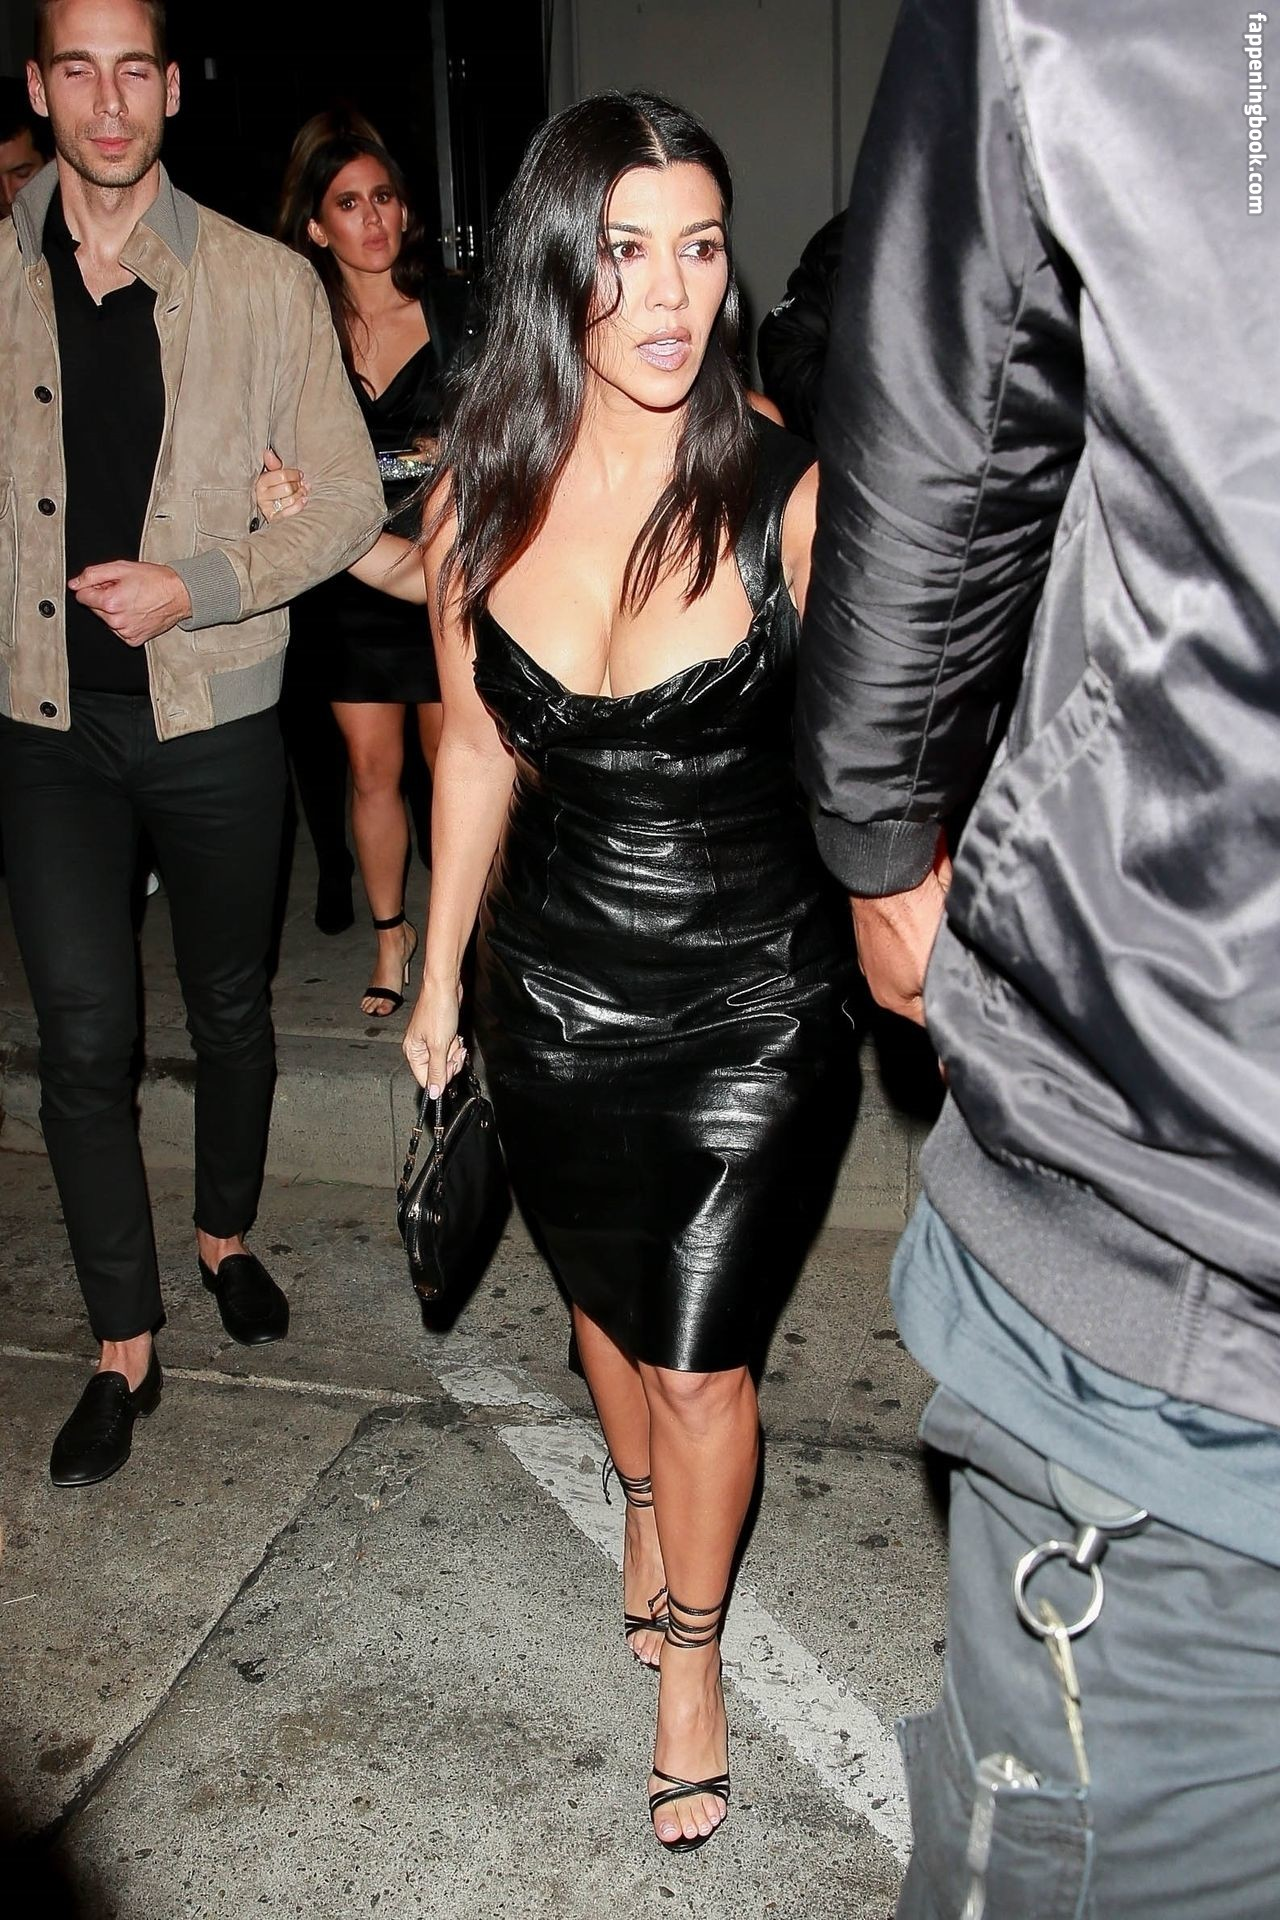 Kourtney Kardashian Nude The Fappening - FappeningGram